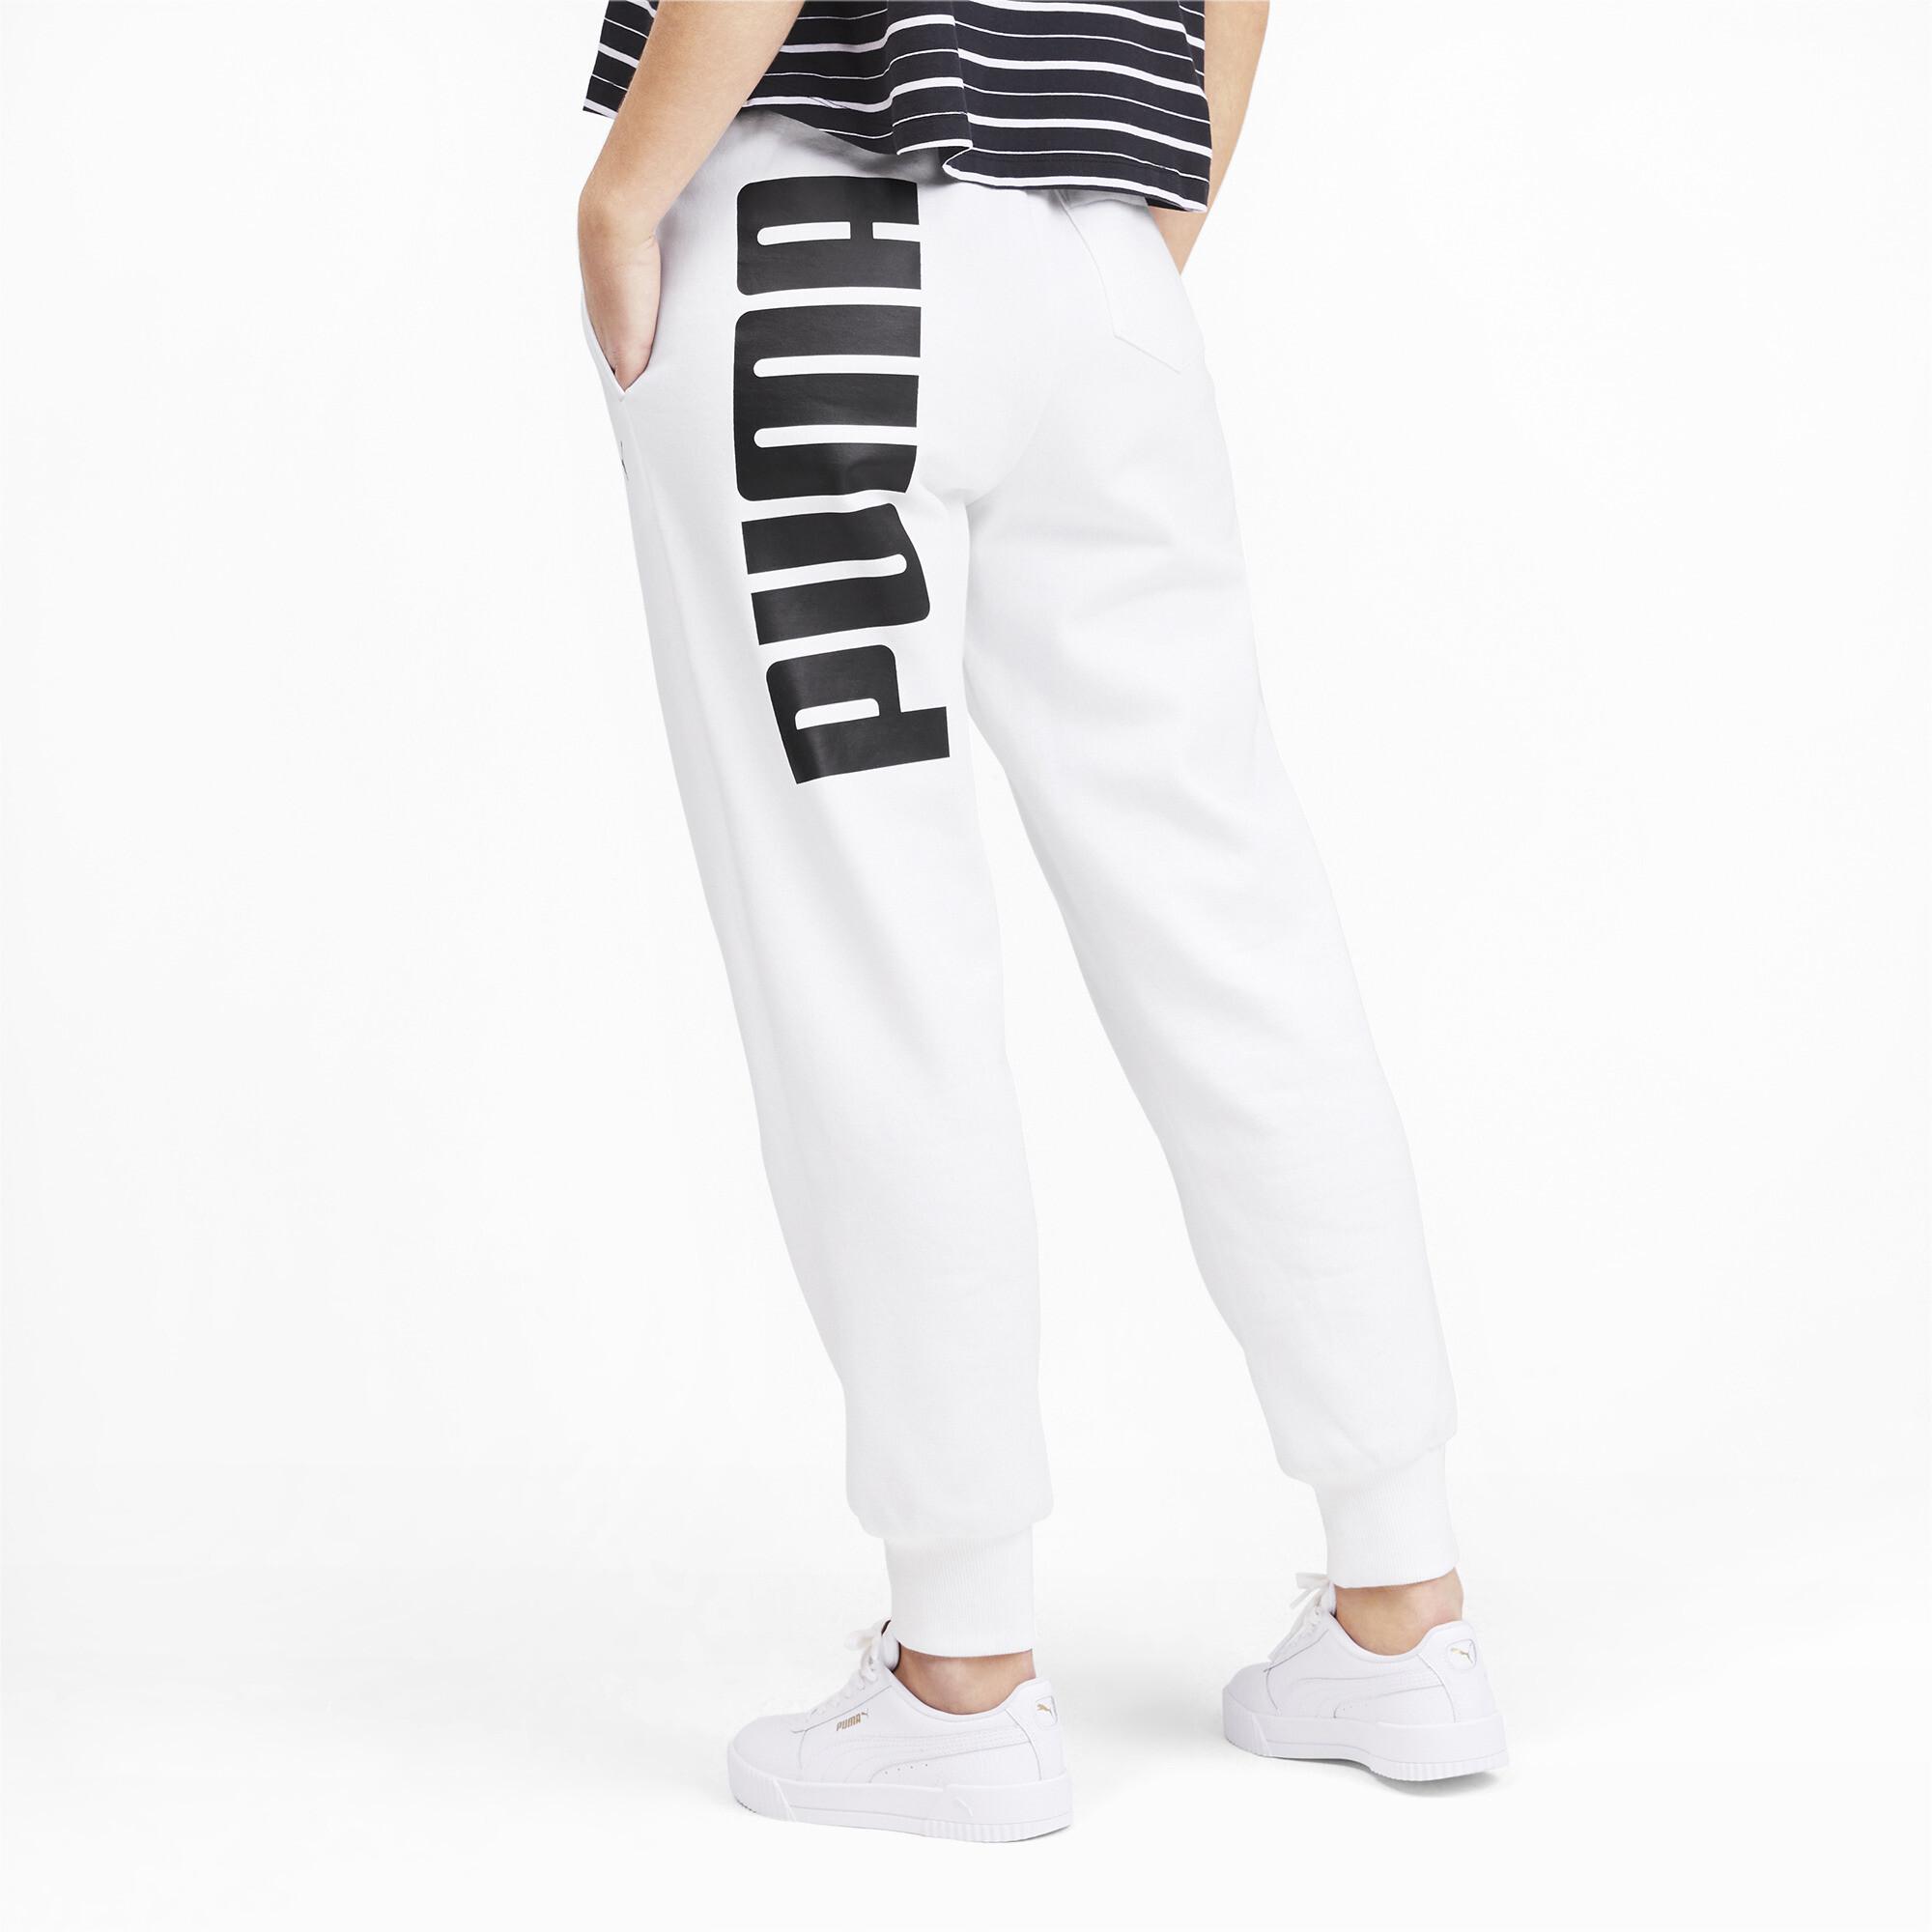 PUMA-Rebel-Women-039-s-Sweatpants-Women-Knitted-Pants-Basics thumbnail 10